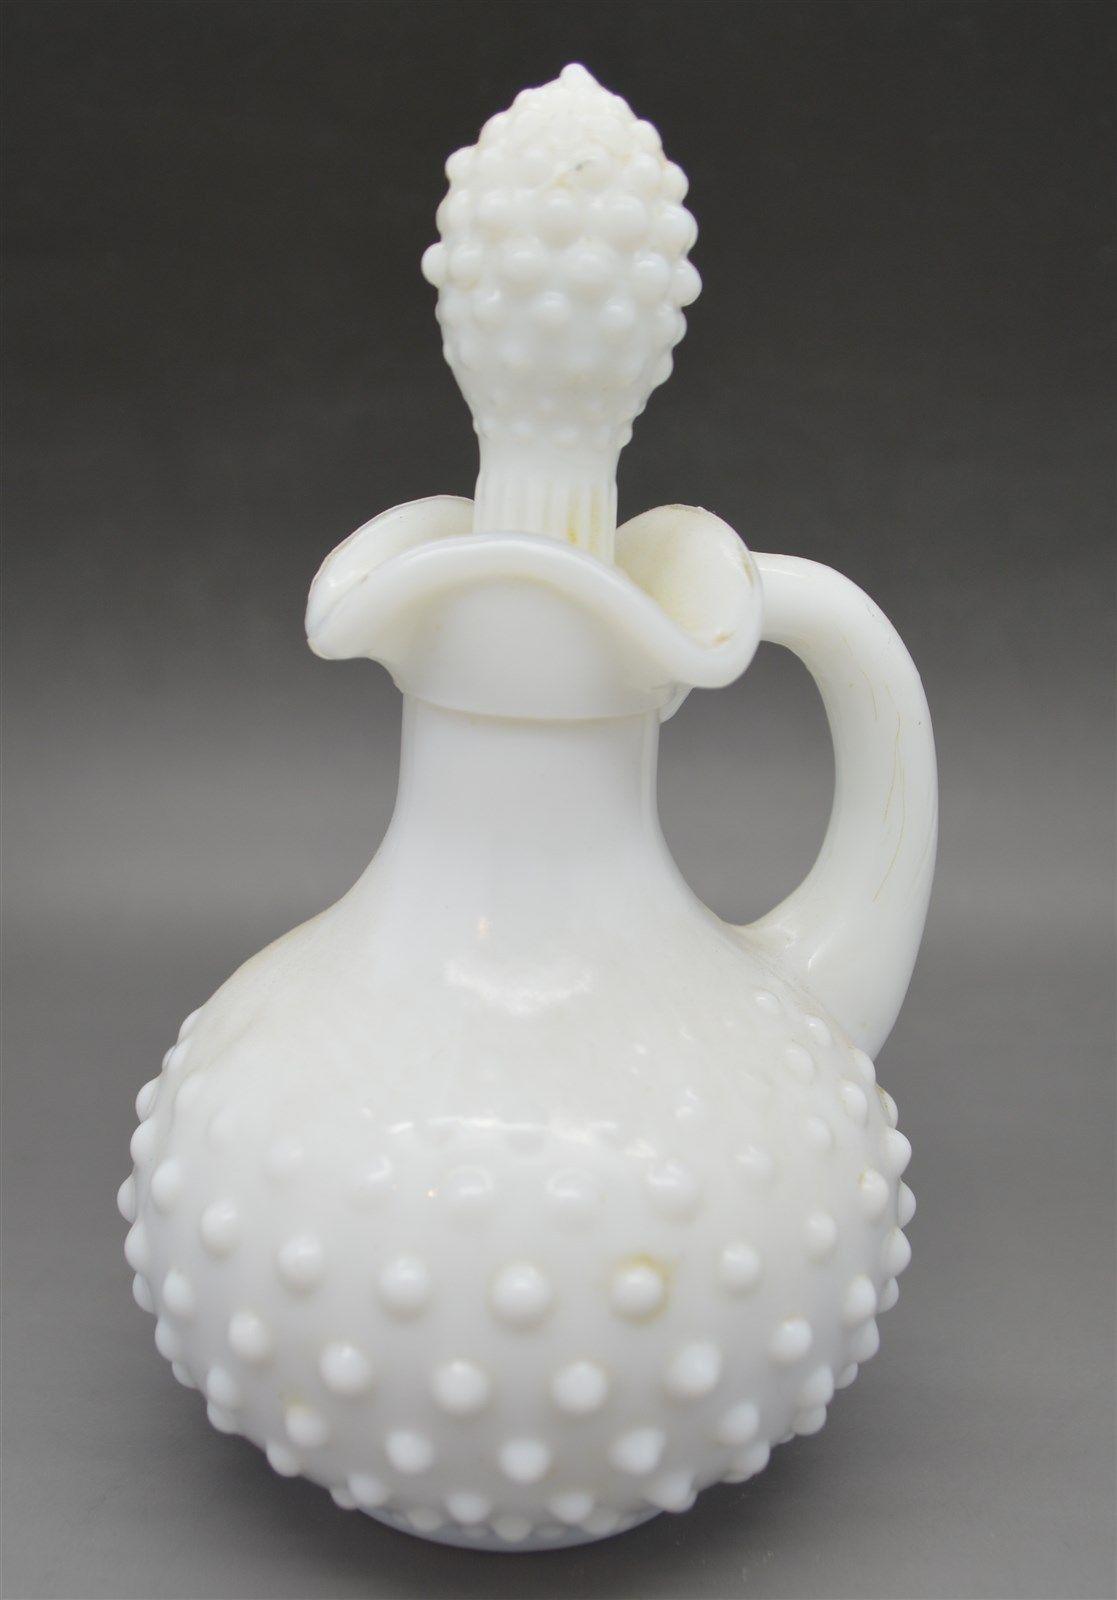 Pair Of Old Avon Milk Glass Oil Vinegar Cruet Set White Hobnail